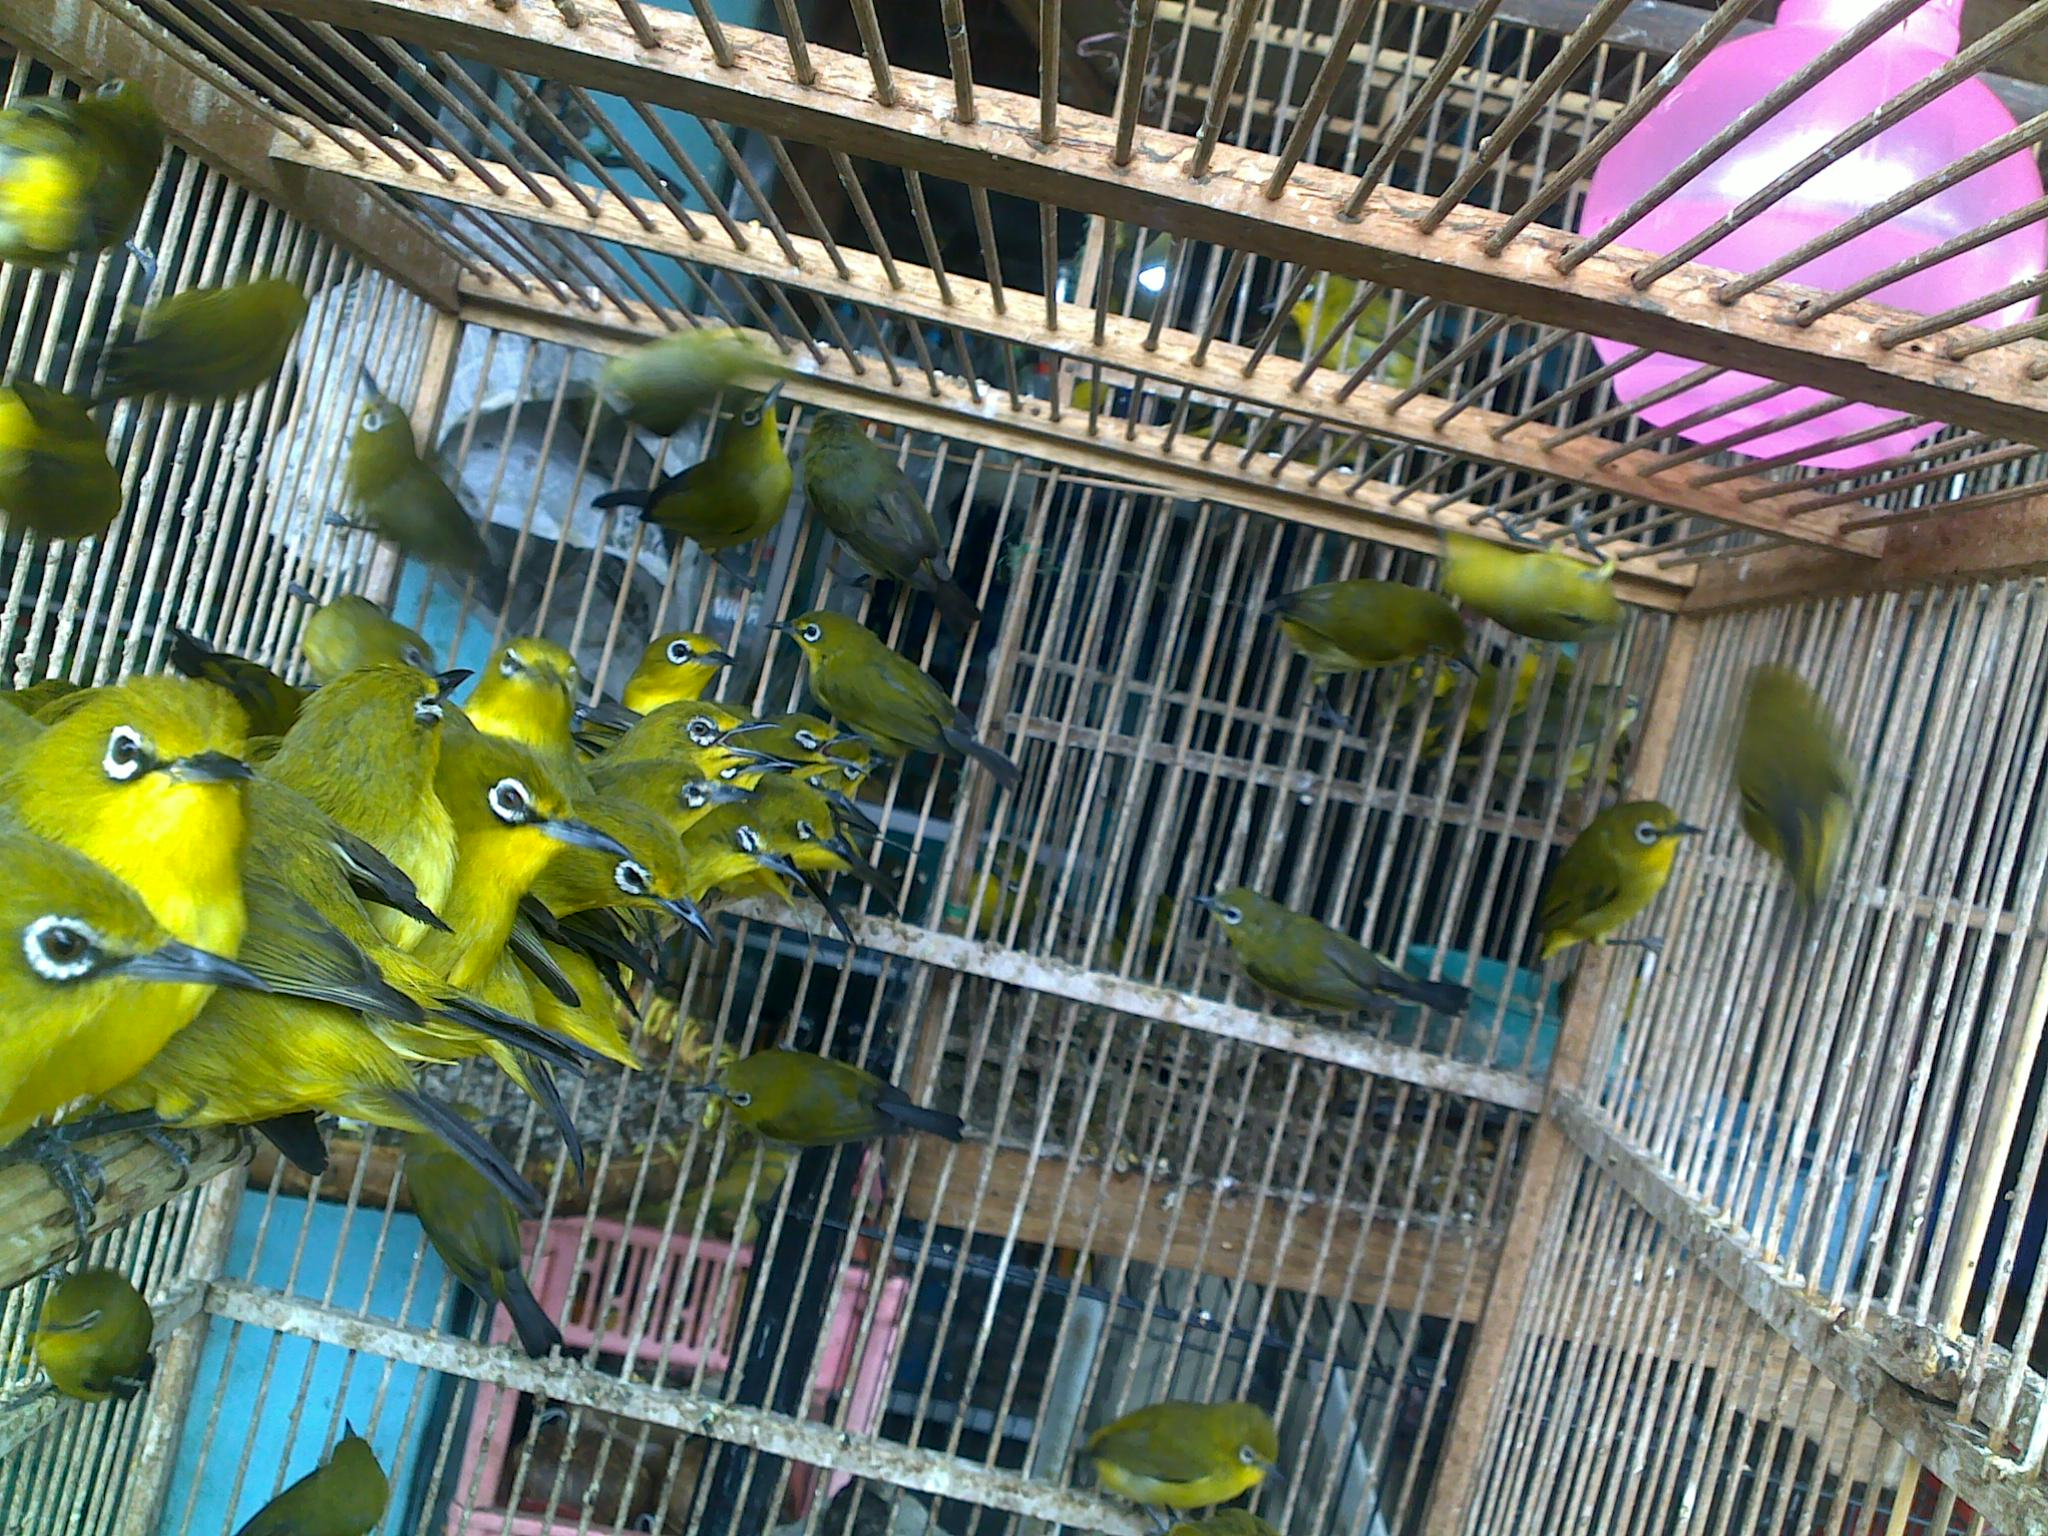 Ngombyok Burung Pleci adalah suatu Hobi saya yang sangat menyenangkan ...